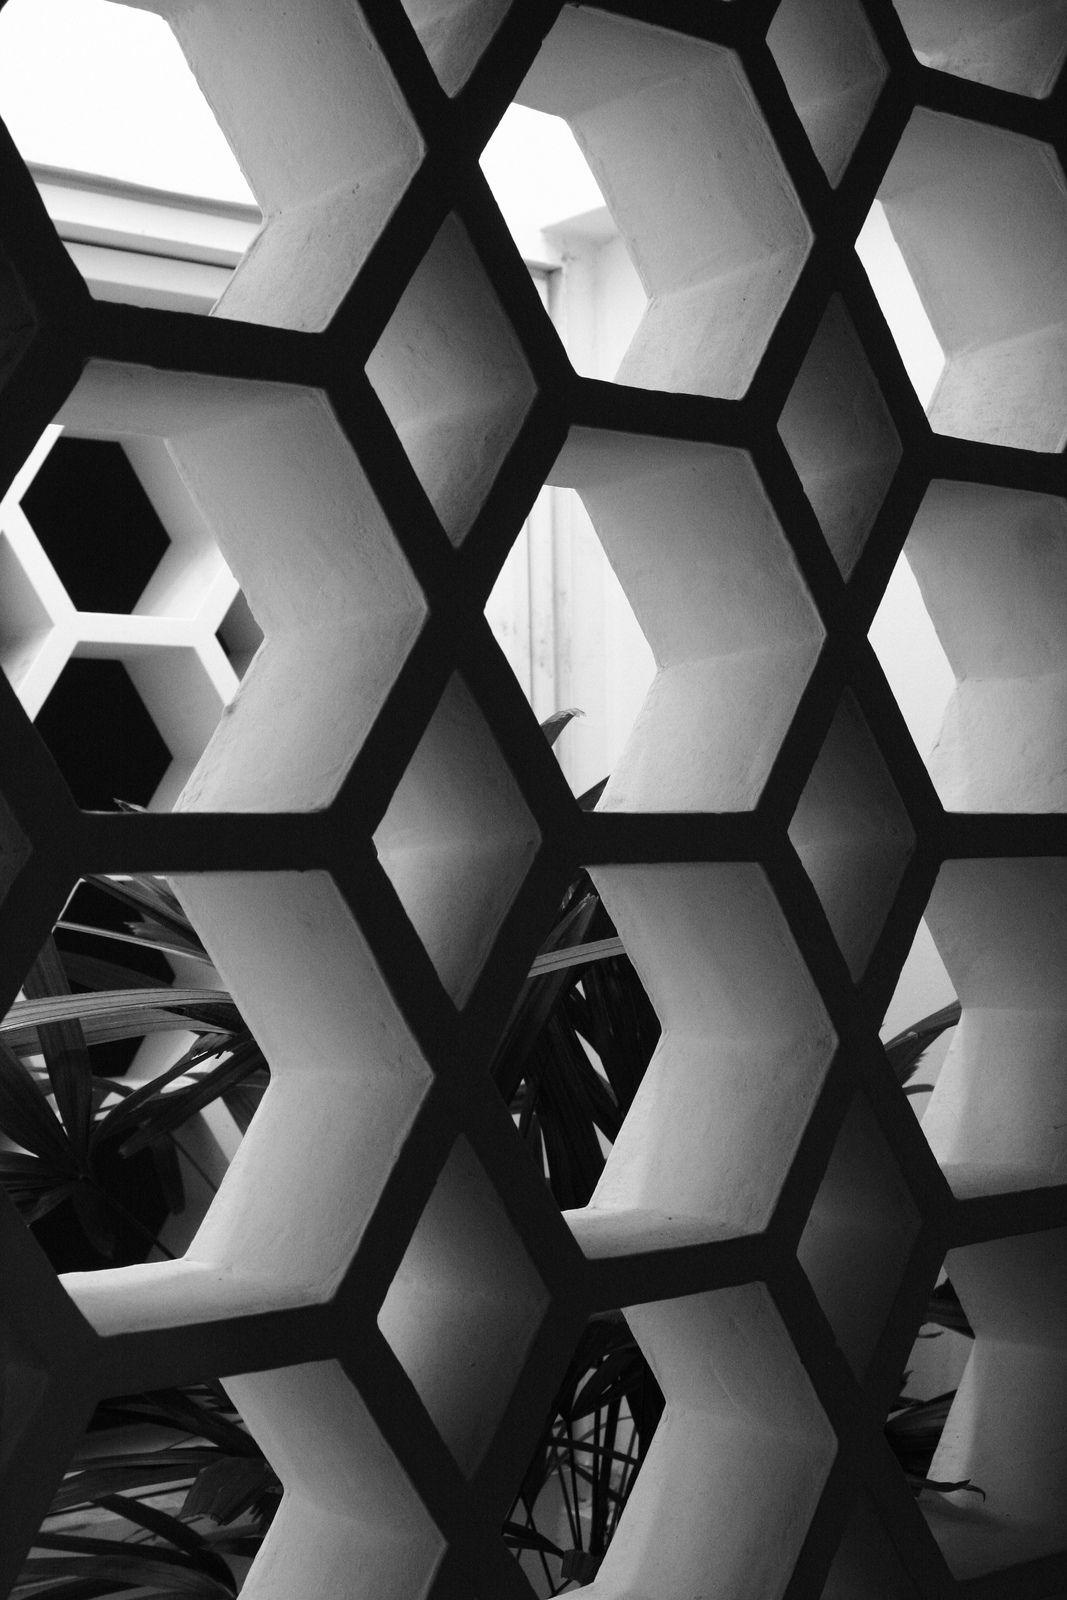 Corey Goldberg Breeze Block Wall Breeze Blocks Precast Concrete